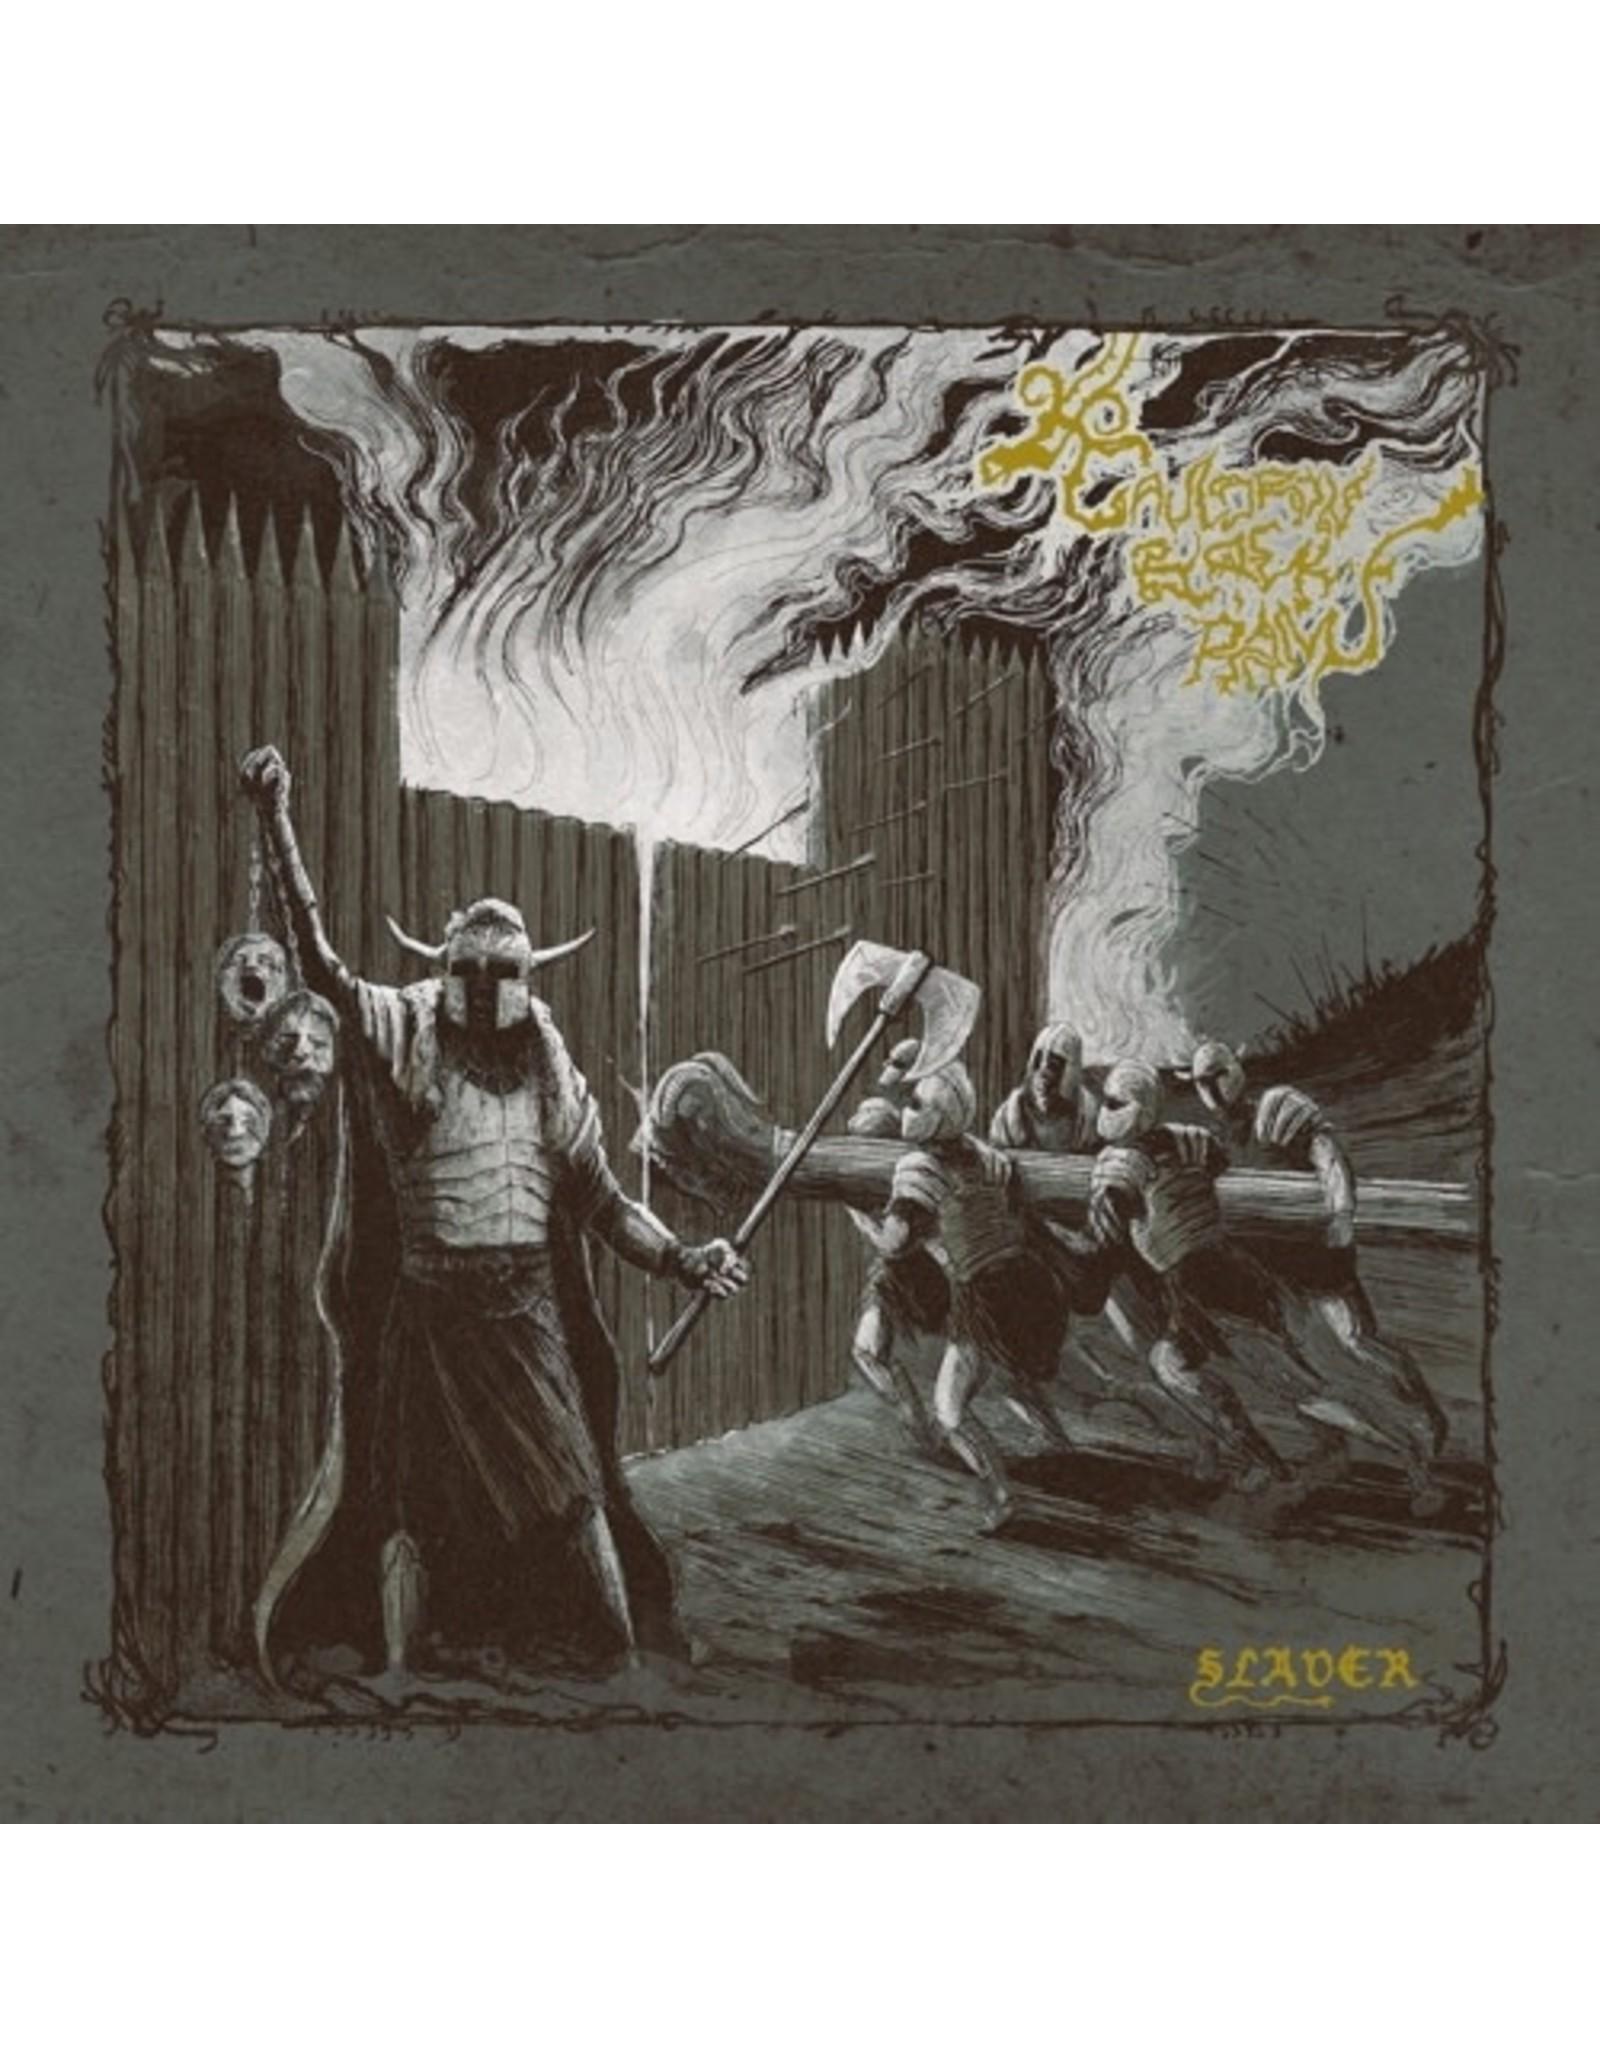 20 Buck Spin Cauldron Black Ram: Slaver (colored) LP